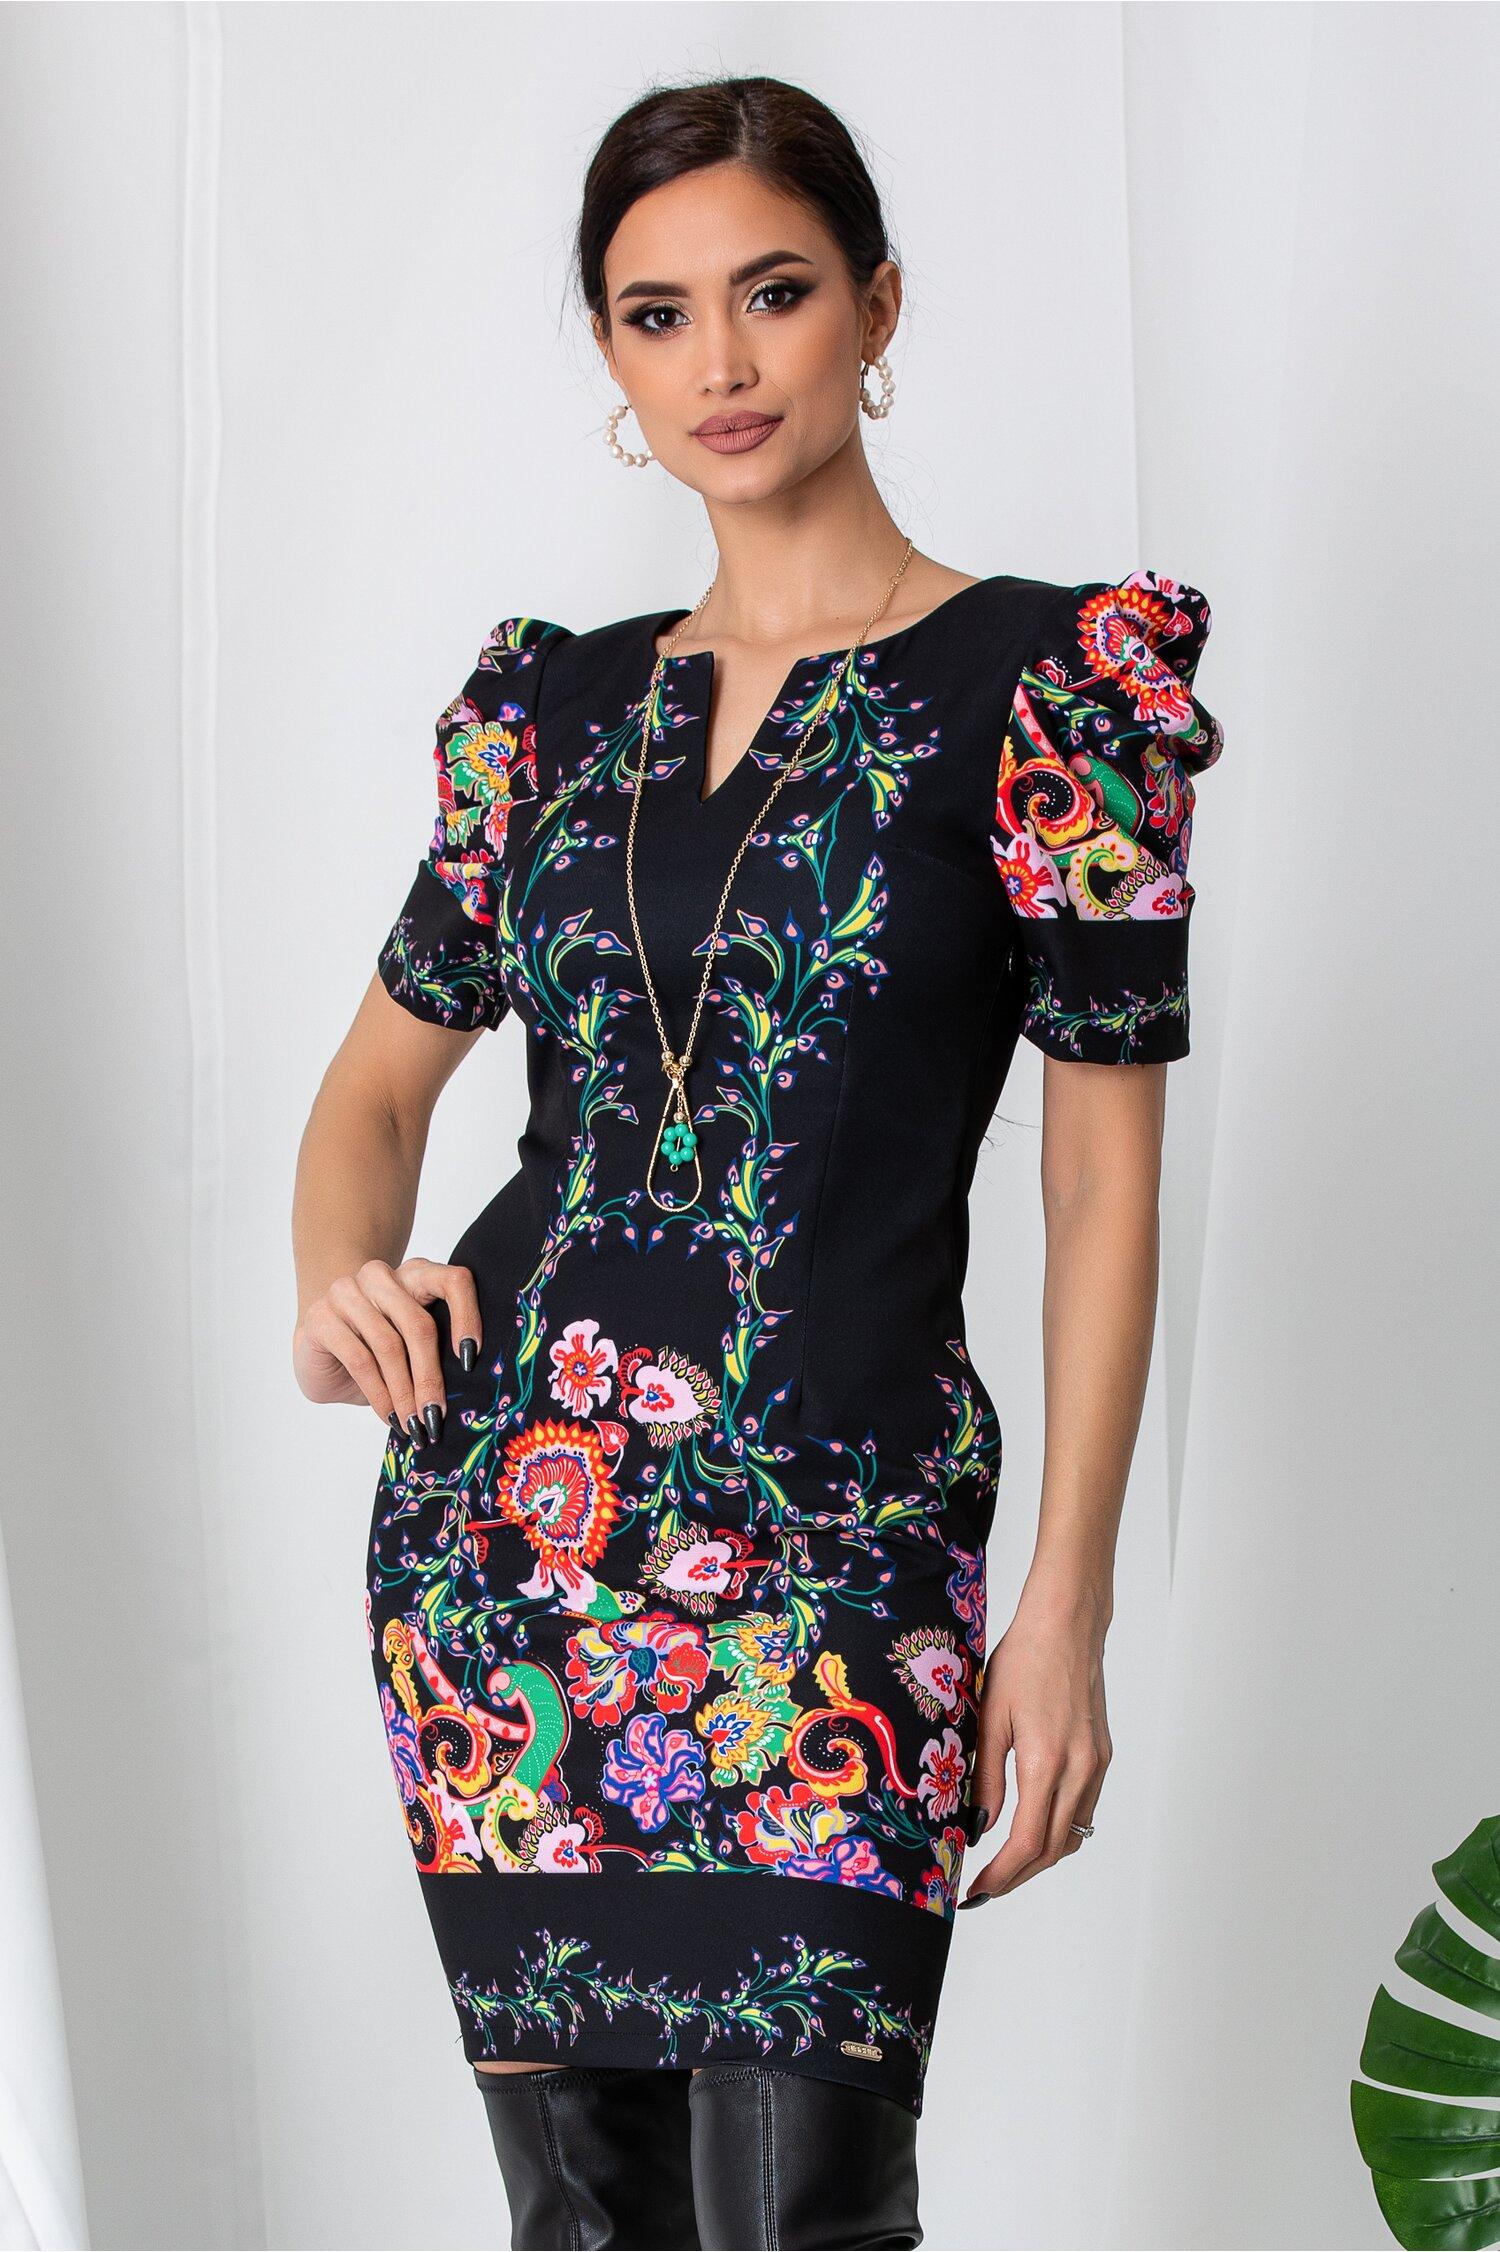 Rochie Lora neagra cu imprimeuri florale